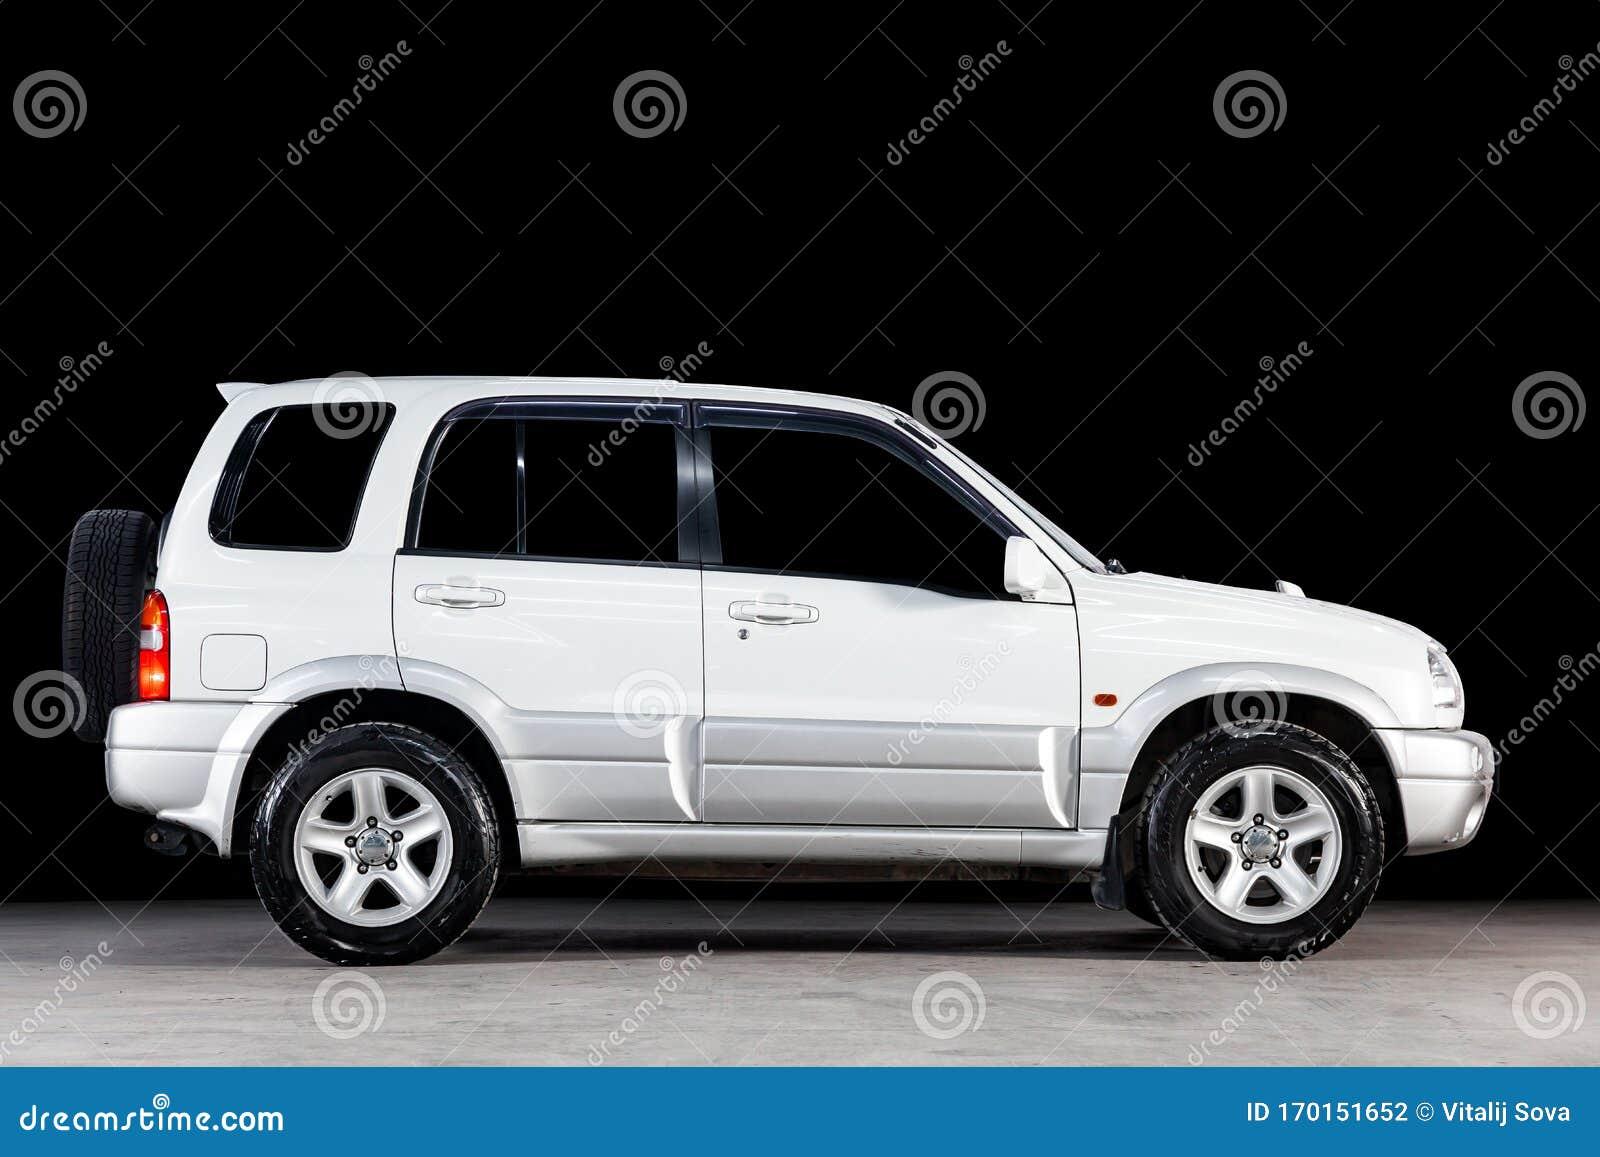 2020 Suzuki Grand Vitara Preview Interior